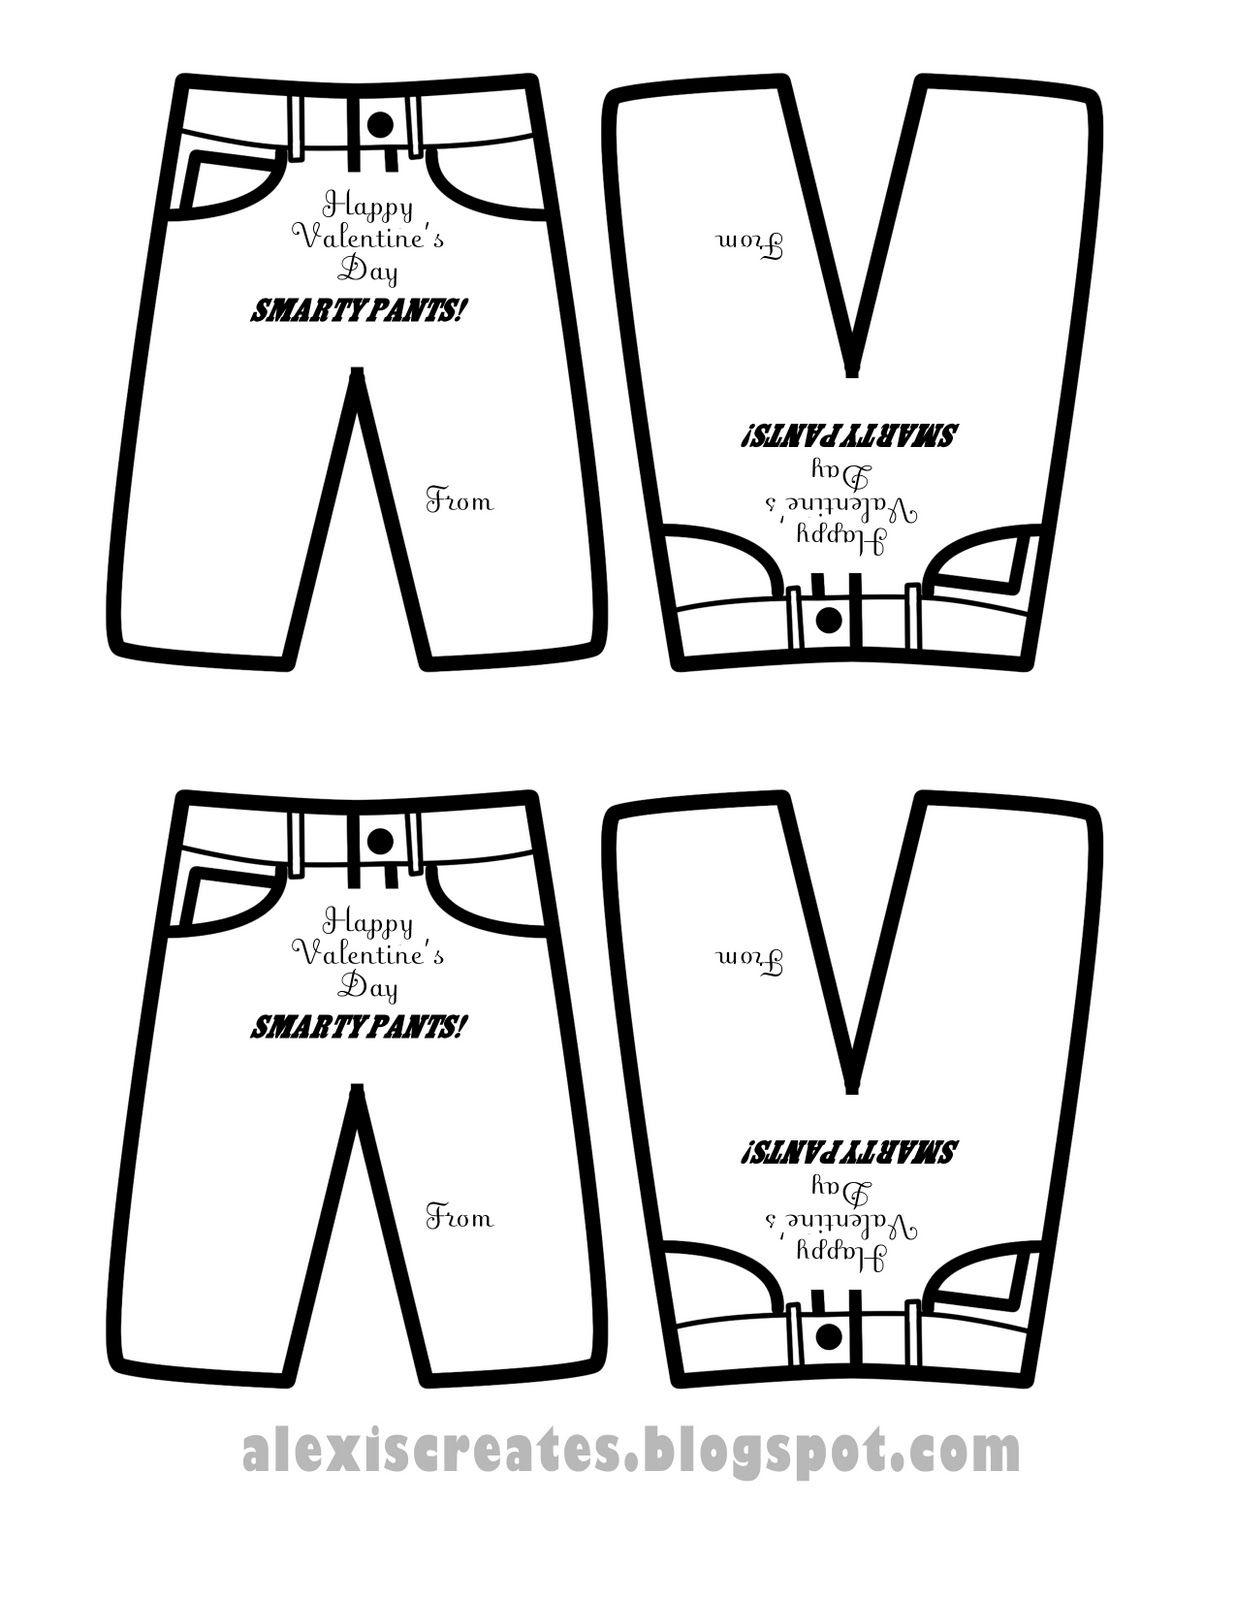 Alexis Design Gallery Printable Smarty Pants Valentine